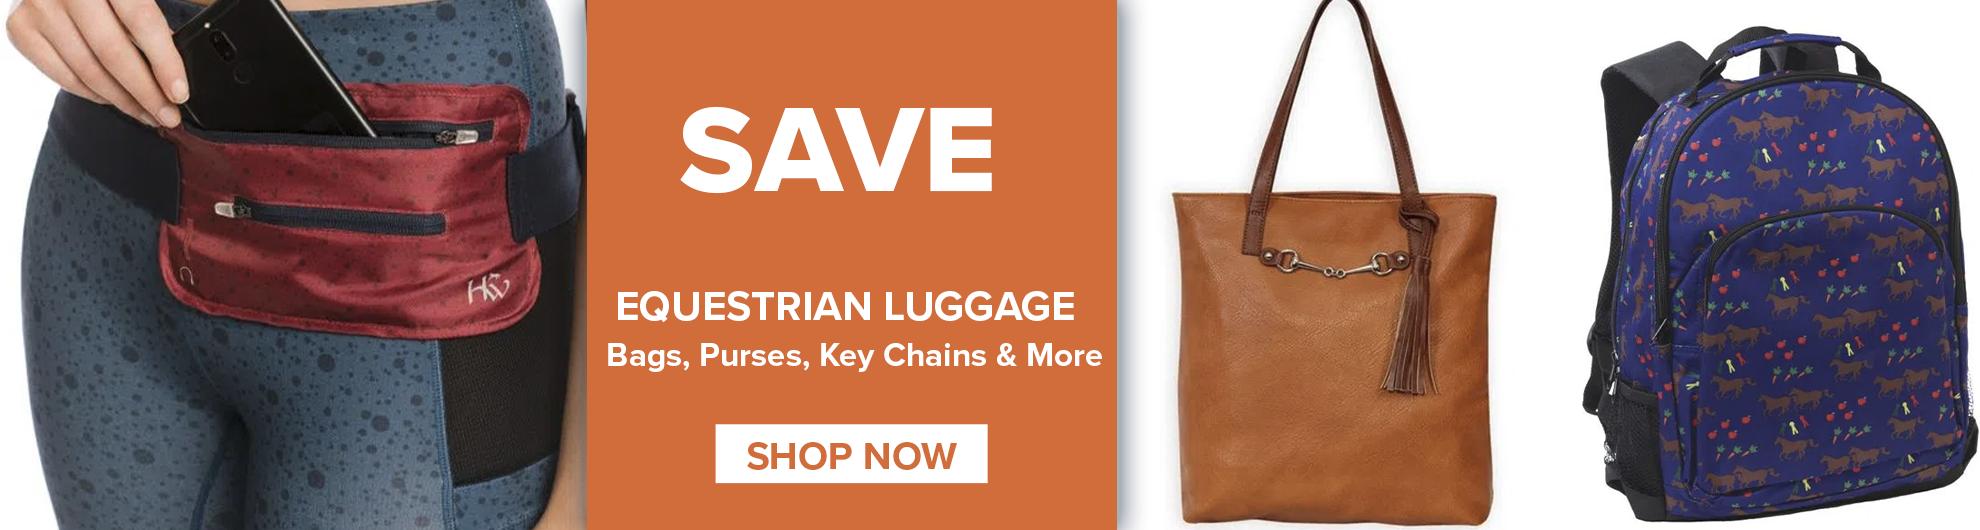 Equestrian Luggage on Sale